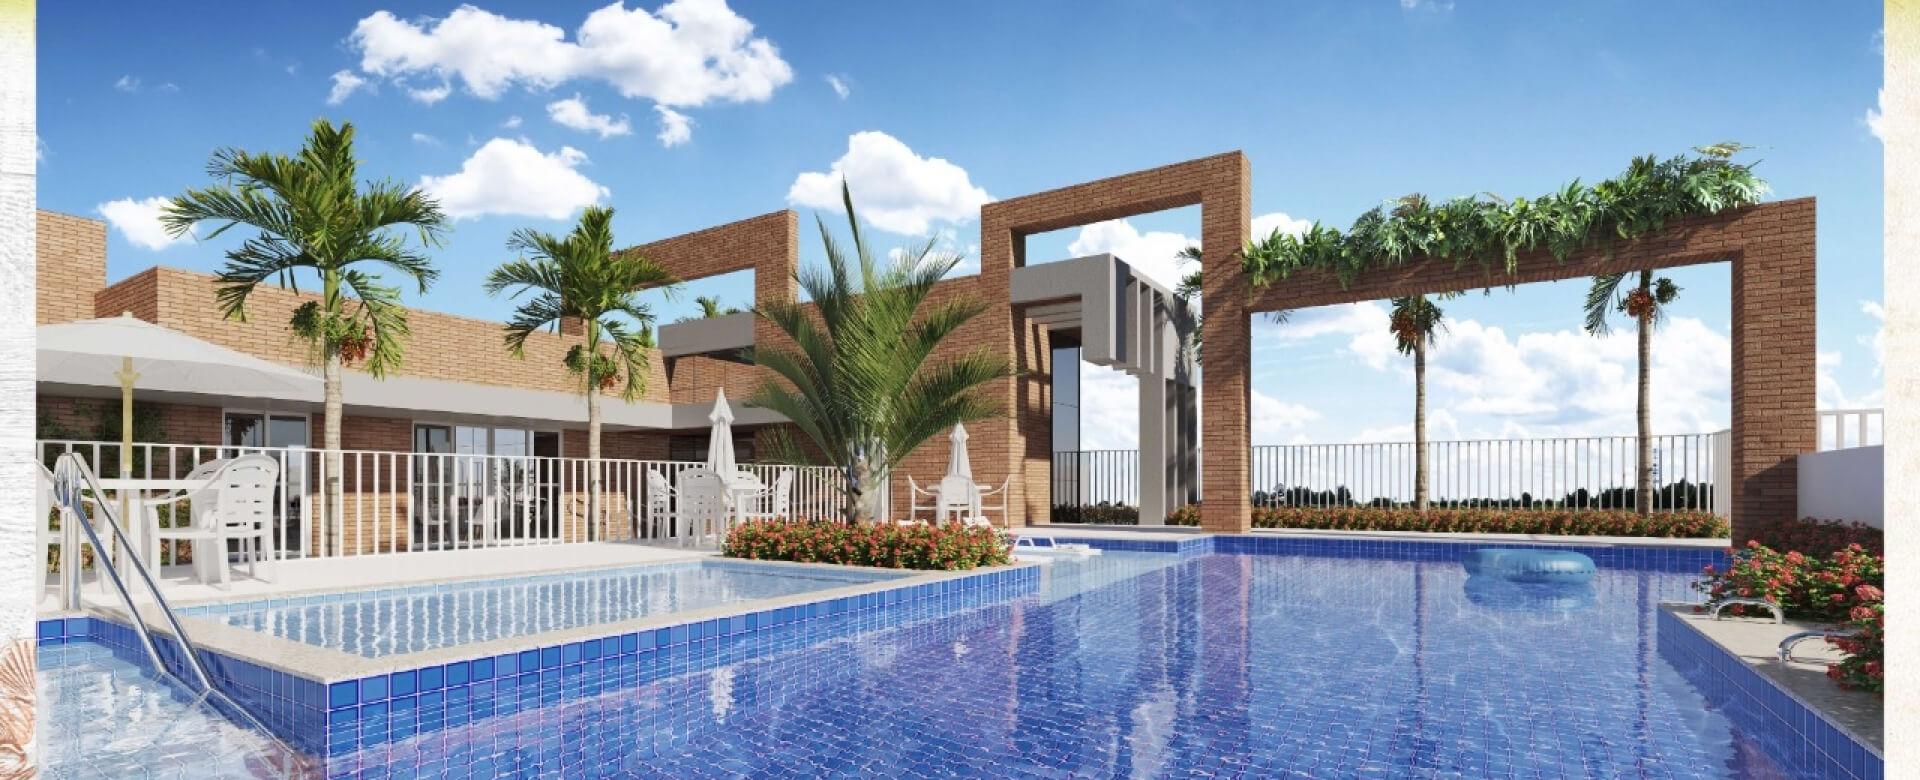 Aruana Praia Residence, foto 1